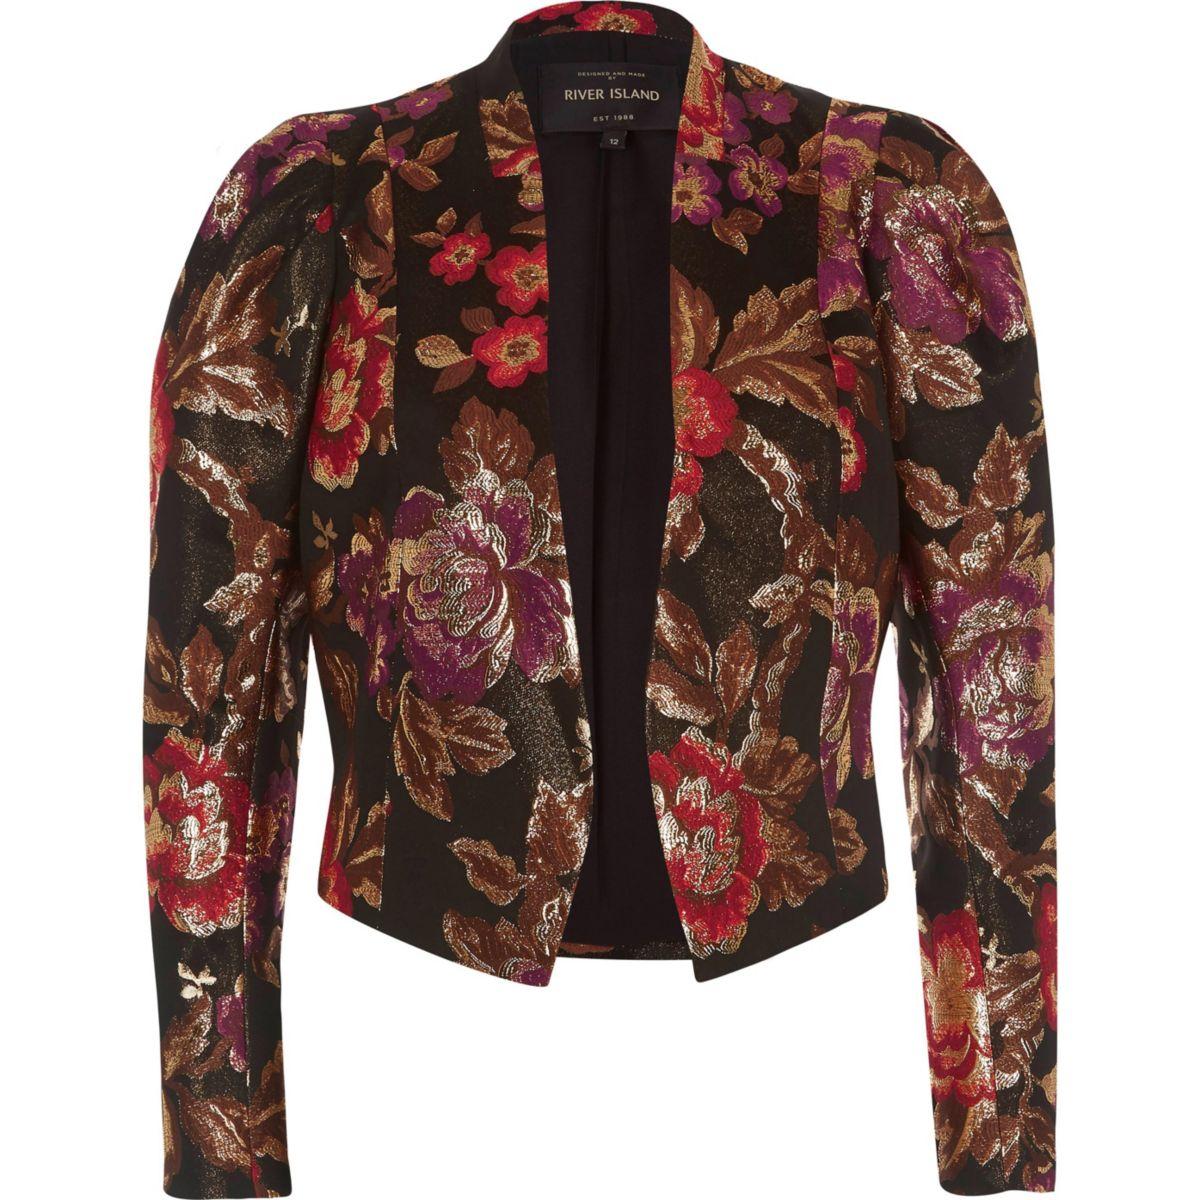 Black jacquard puff sleeve jacket